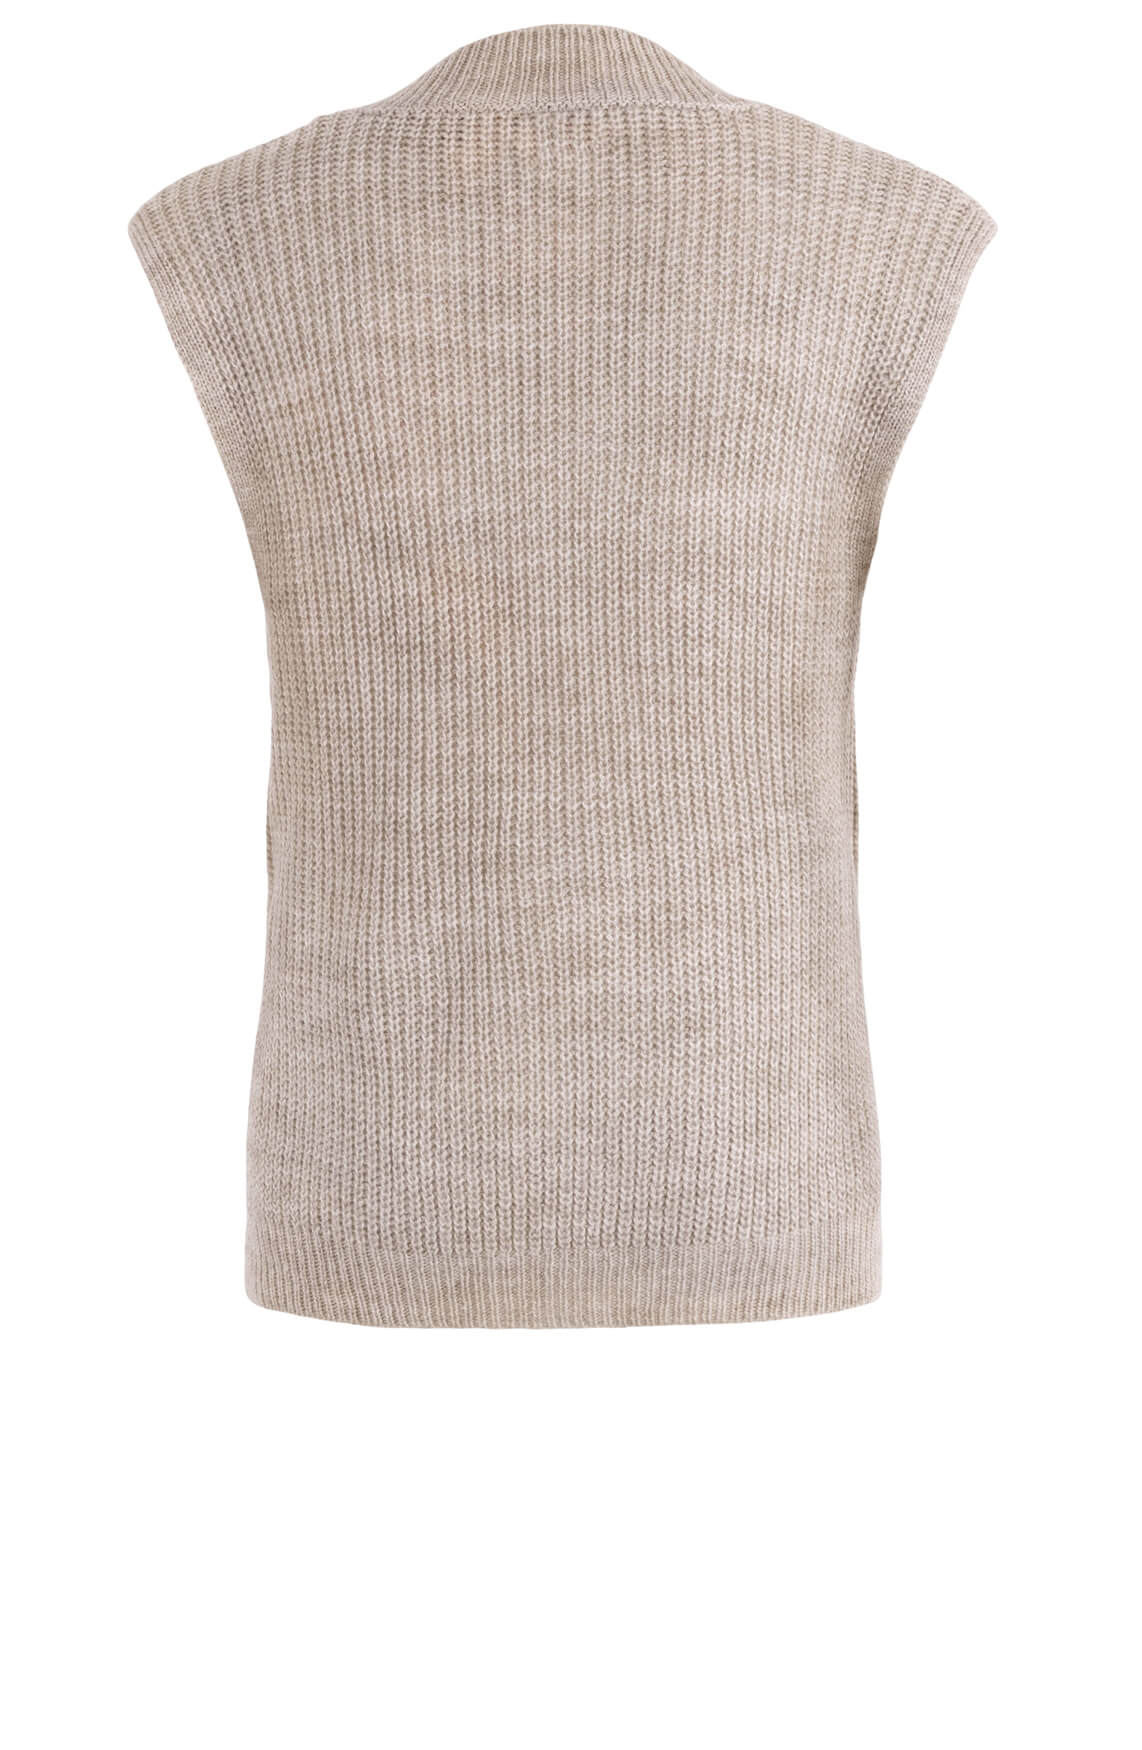 Poools Dames Mouwloze pullover Bruin